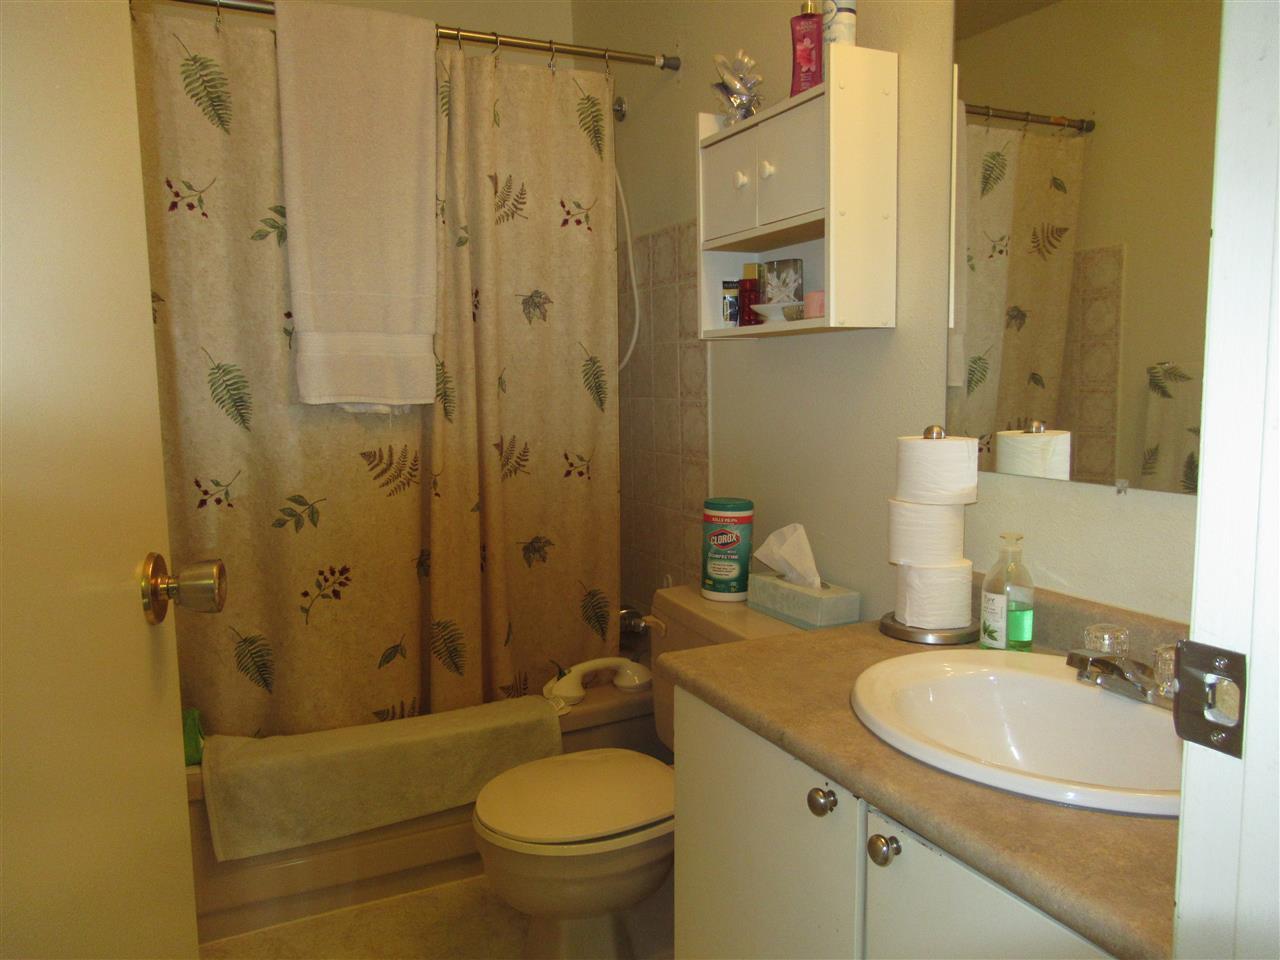 Photo 11: Photos: 101 280 N BROADWAY Avenue in Williams Lake: Williams Lake - City Condo for sale (Williams Lake (Zone 27))  : MLS®# R2382503